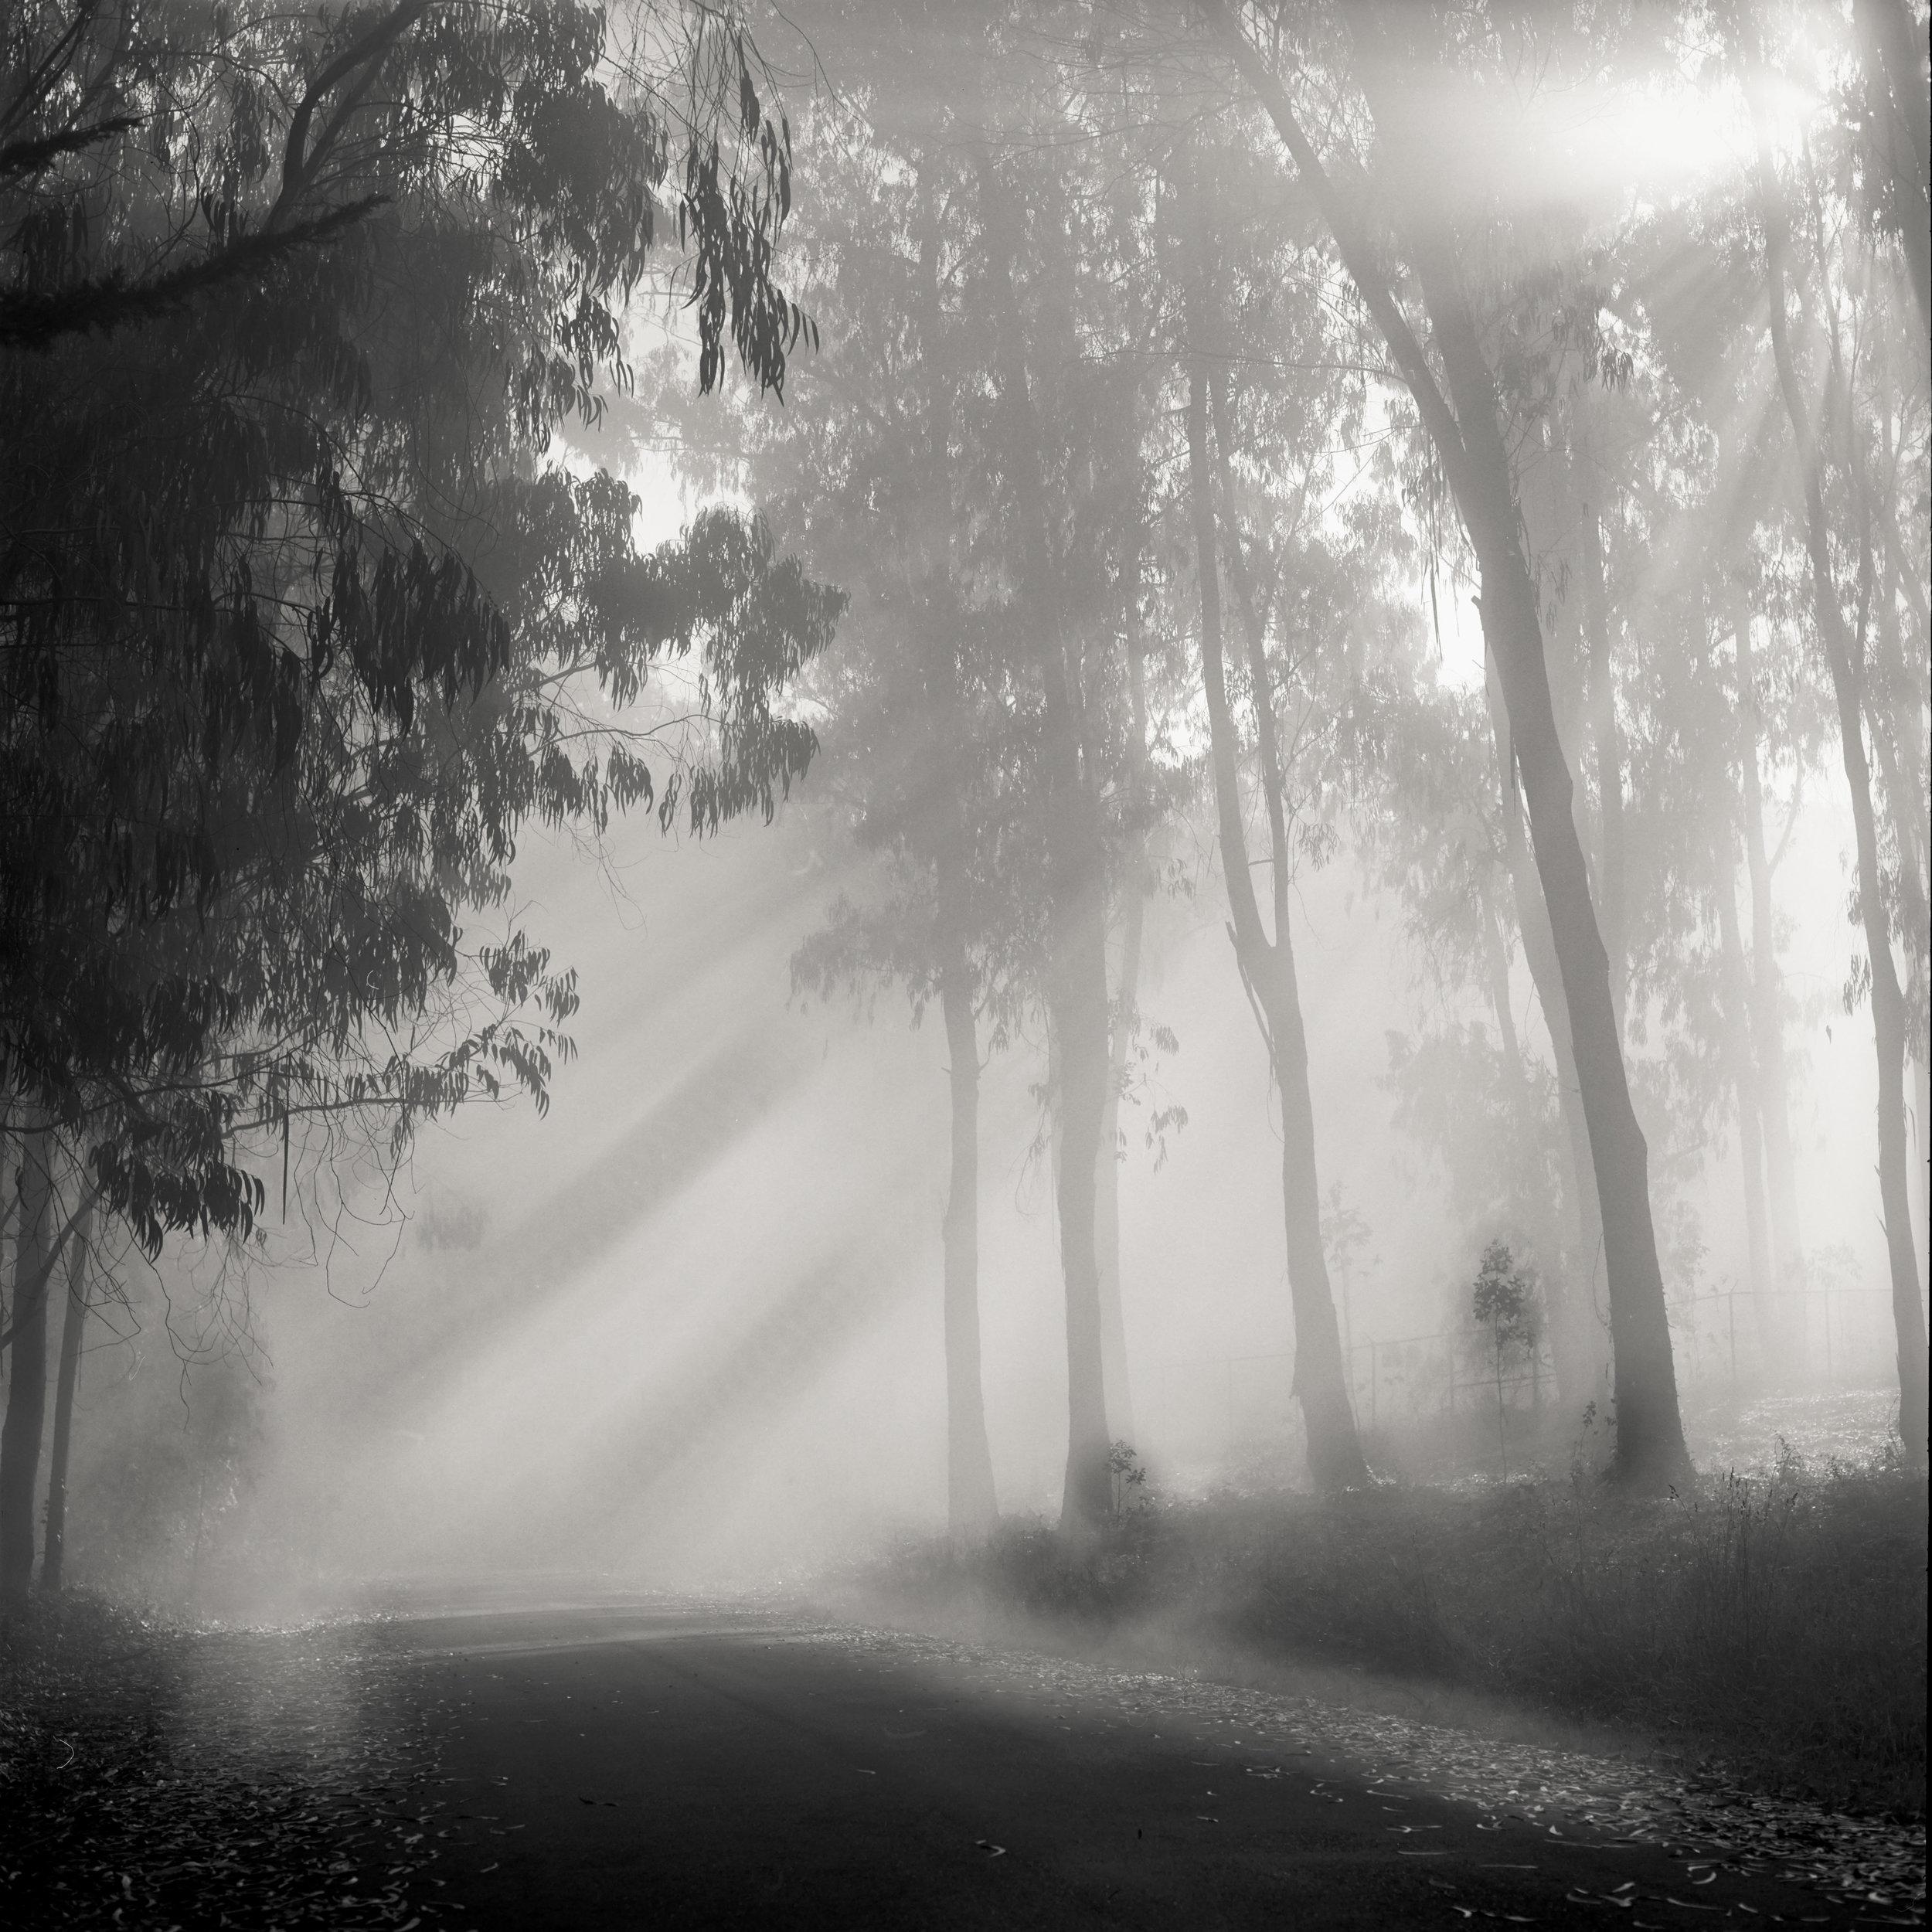 San Francisco presidio black white fog mist trees empty road